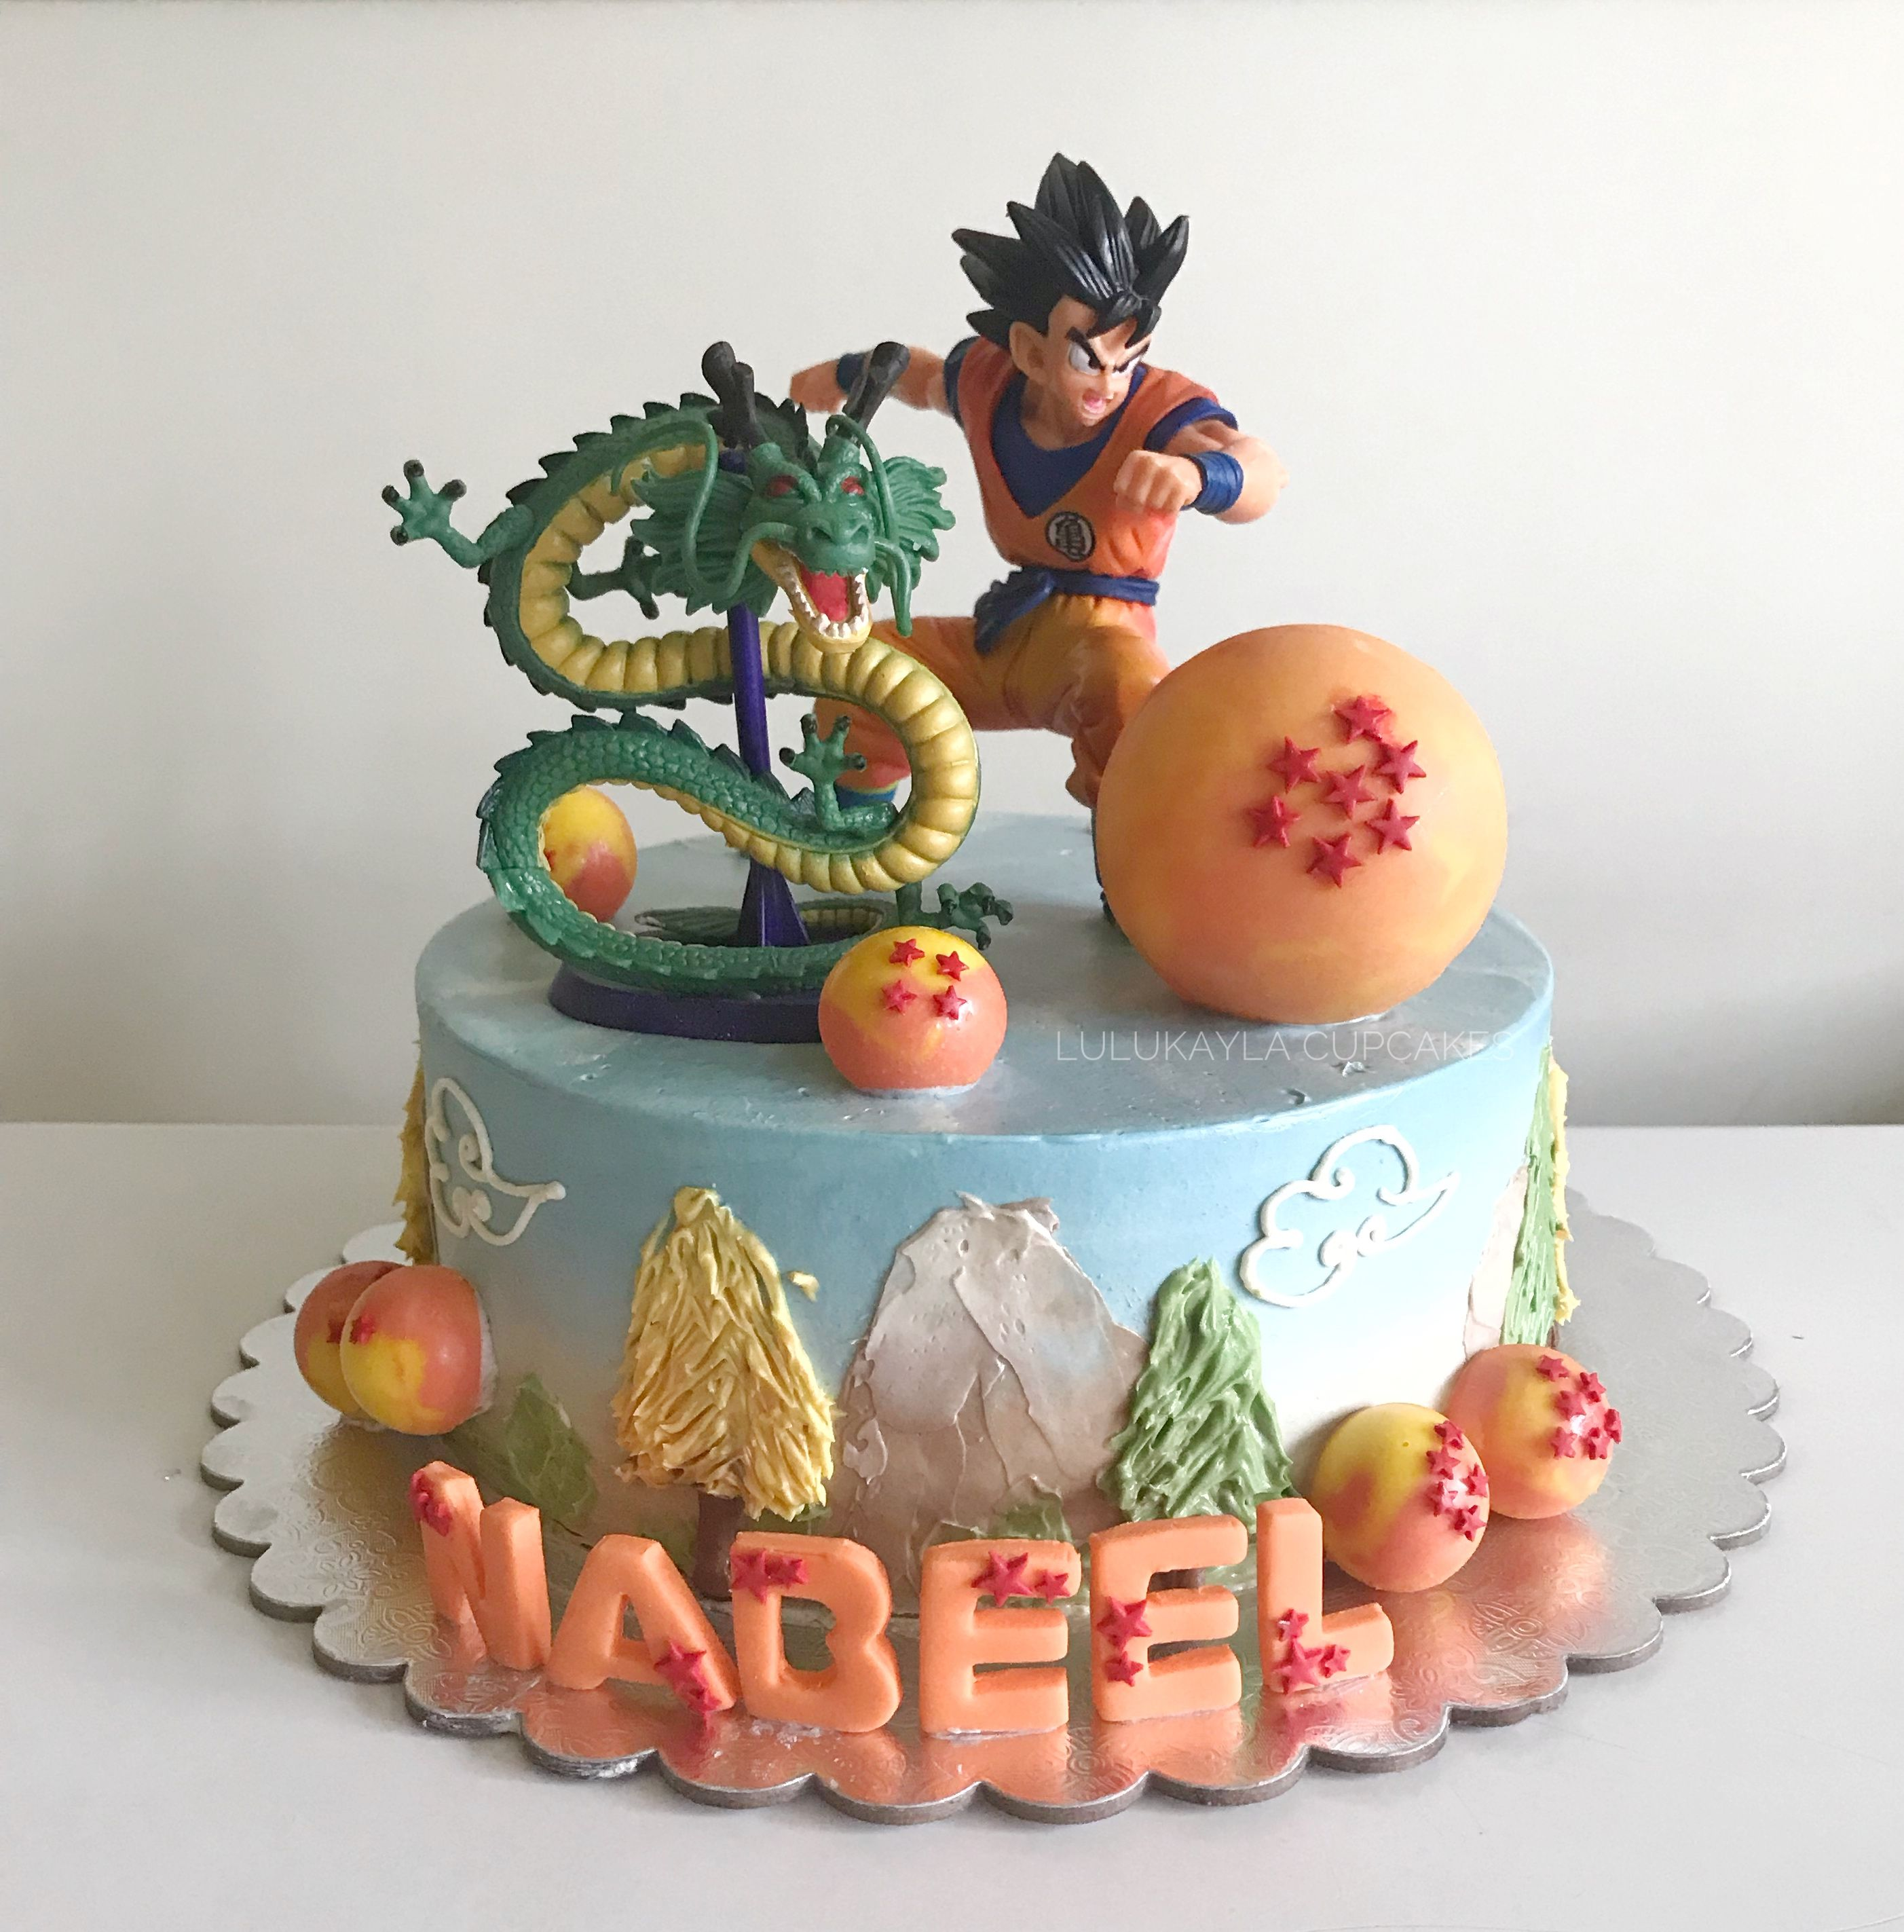 Dragon Ball Z Cake With Images Cake Birthday Cake Dragon Ball Z